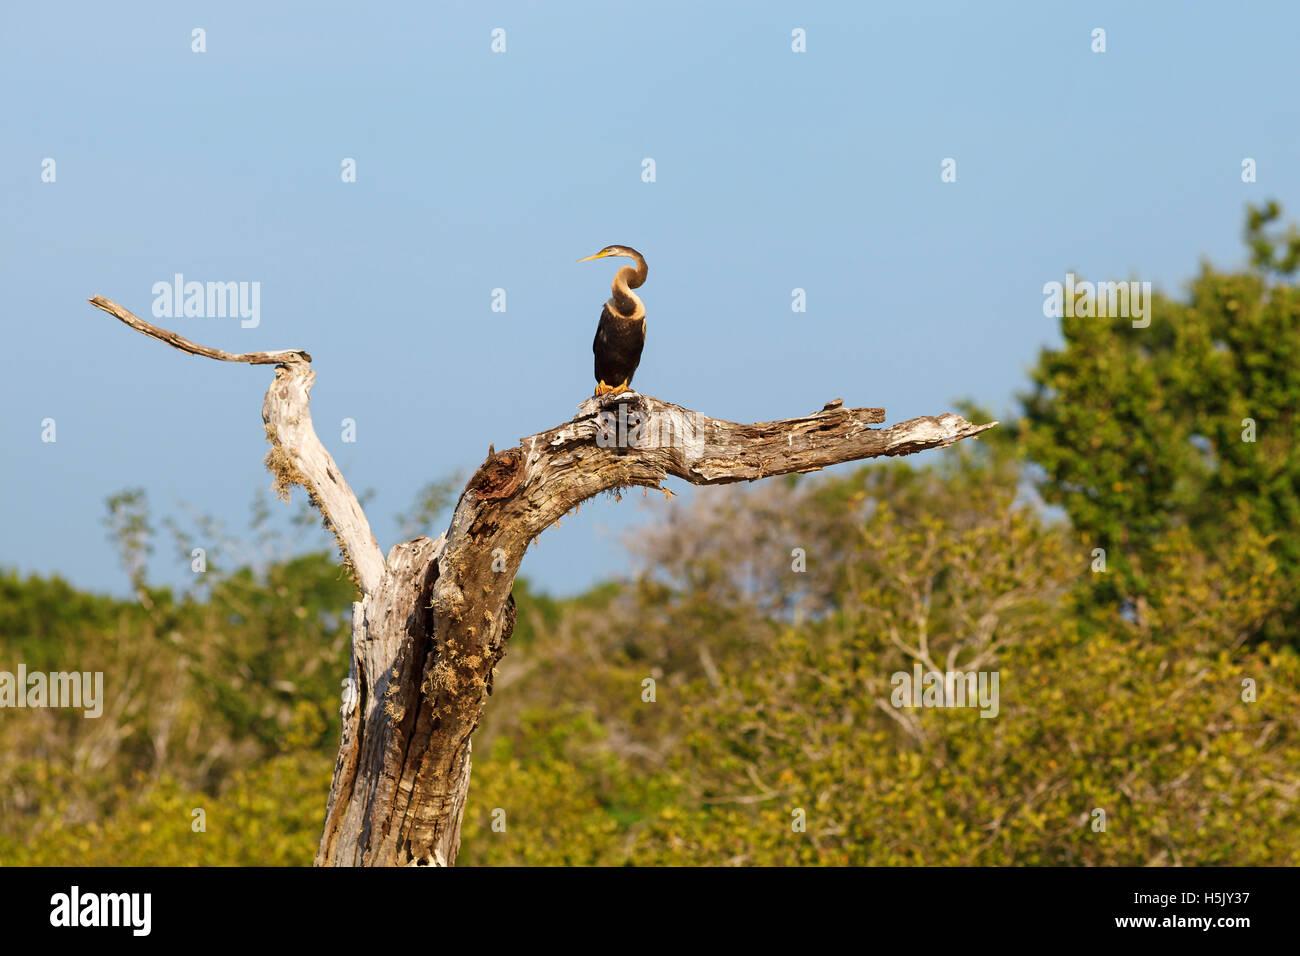 Oriental Darter sitting on tree against blue sky, Yala National Park, Sri Lanka - Stock Image